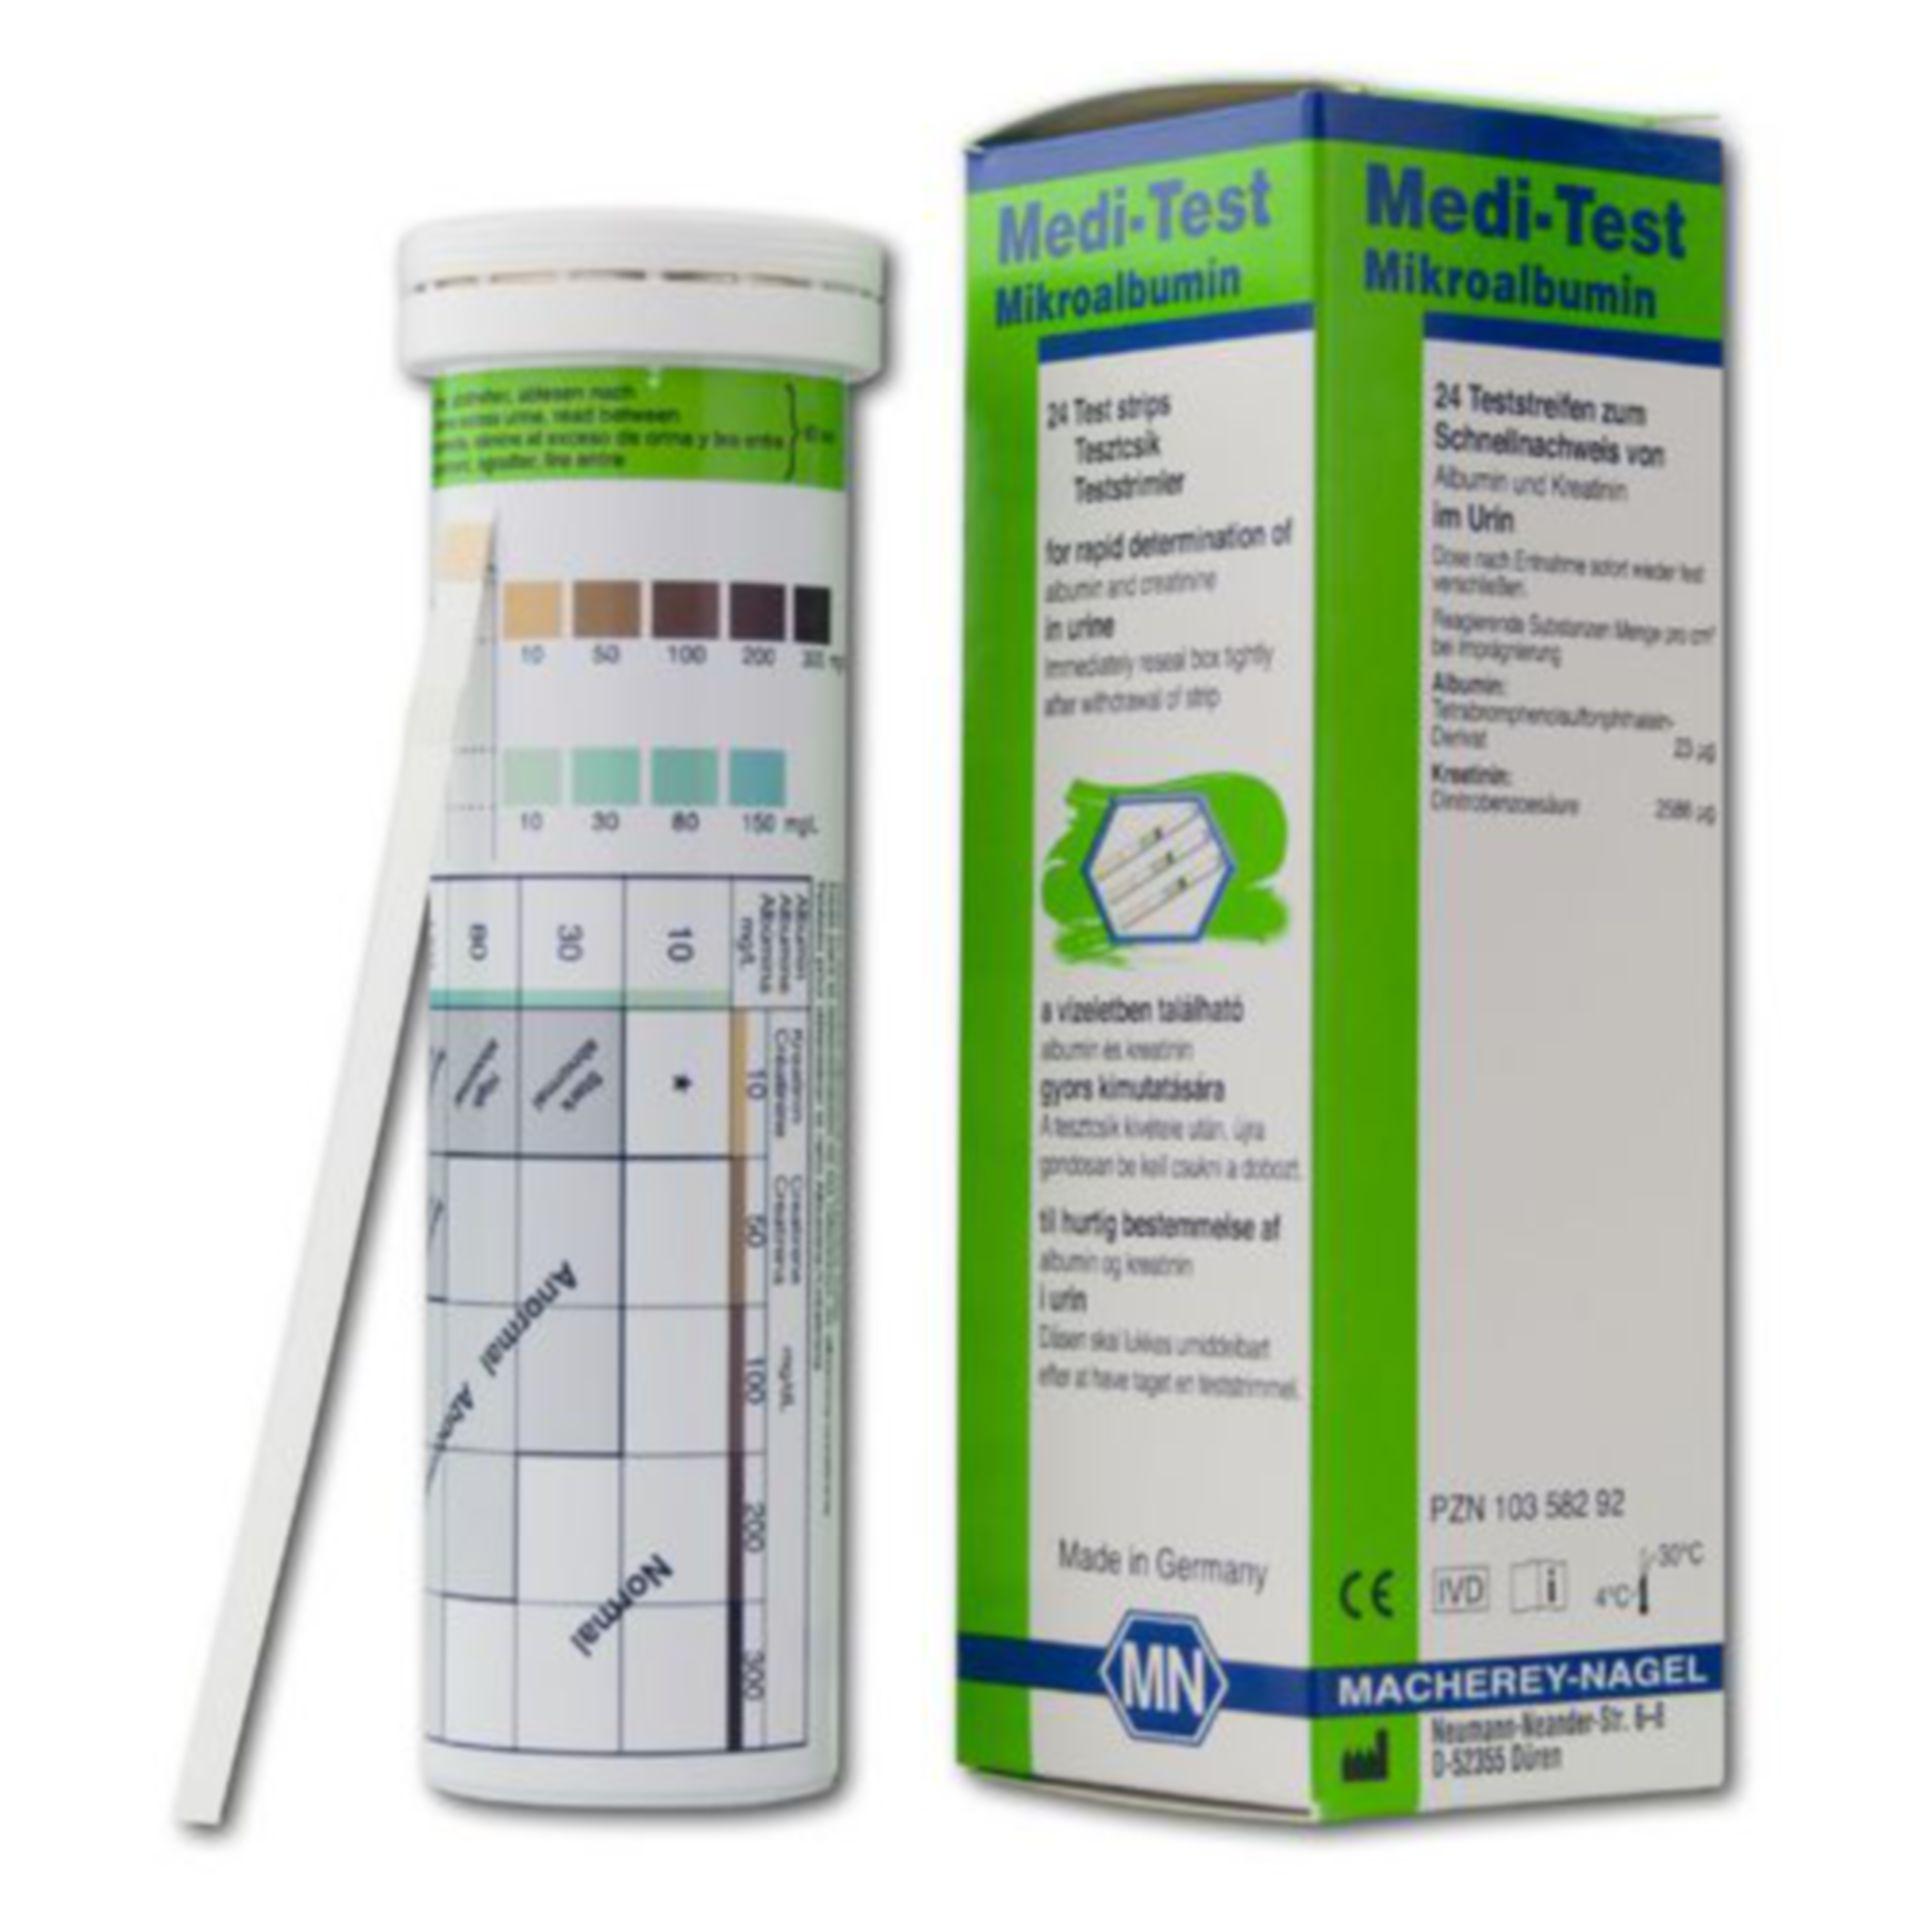 ! NUEVO - Medi-Test Mikroalbumin !